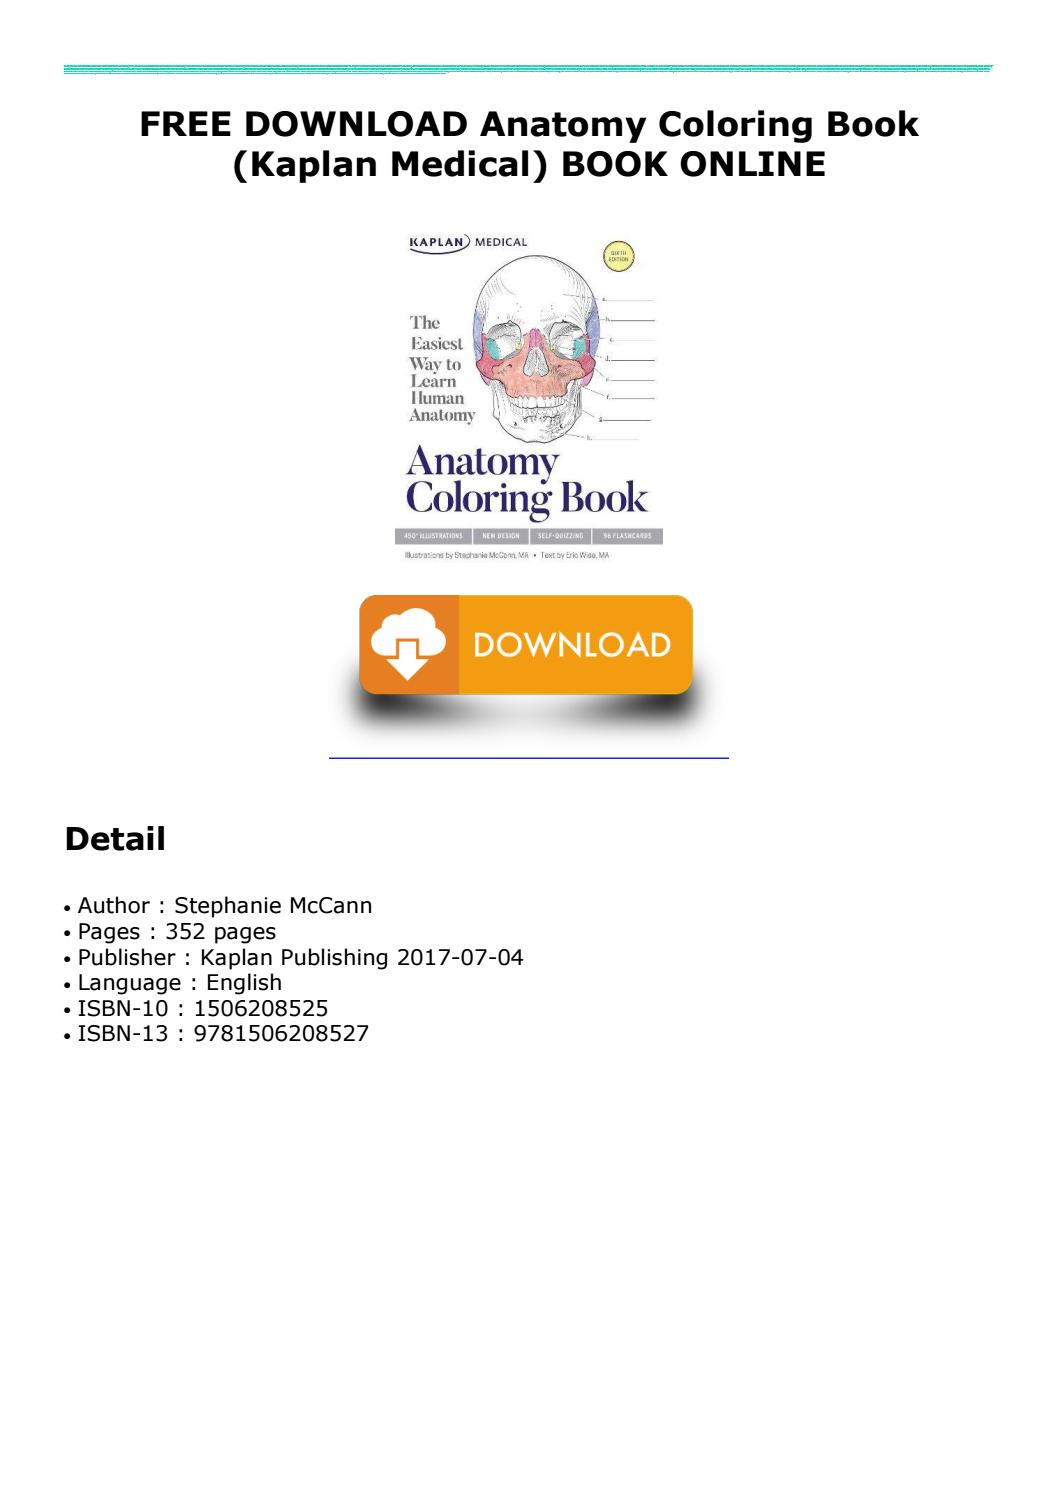 Free Download Anatomy Coloring Book (kaplan Medical) Book Online